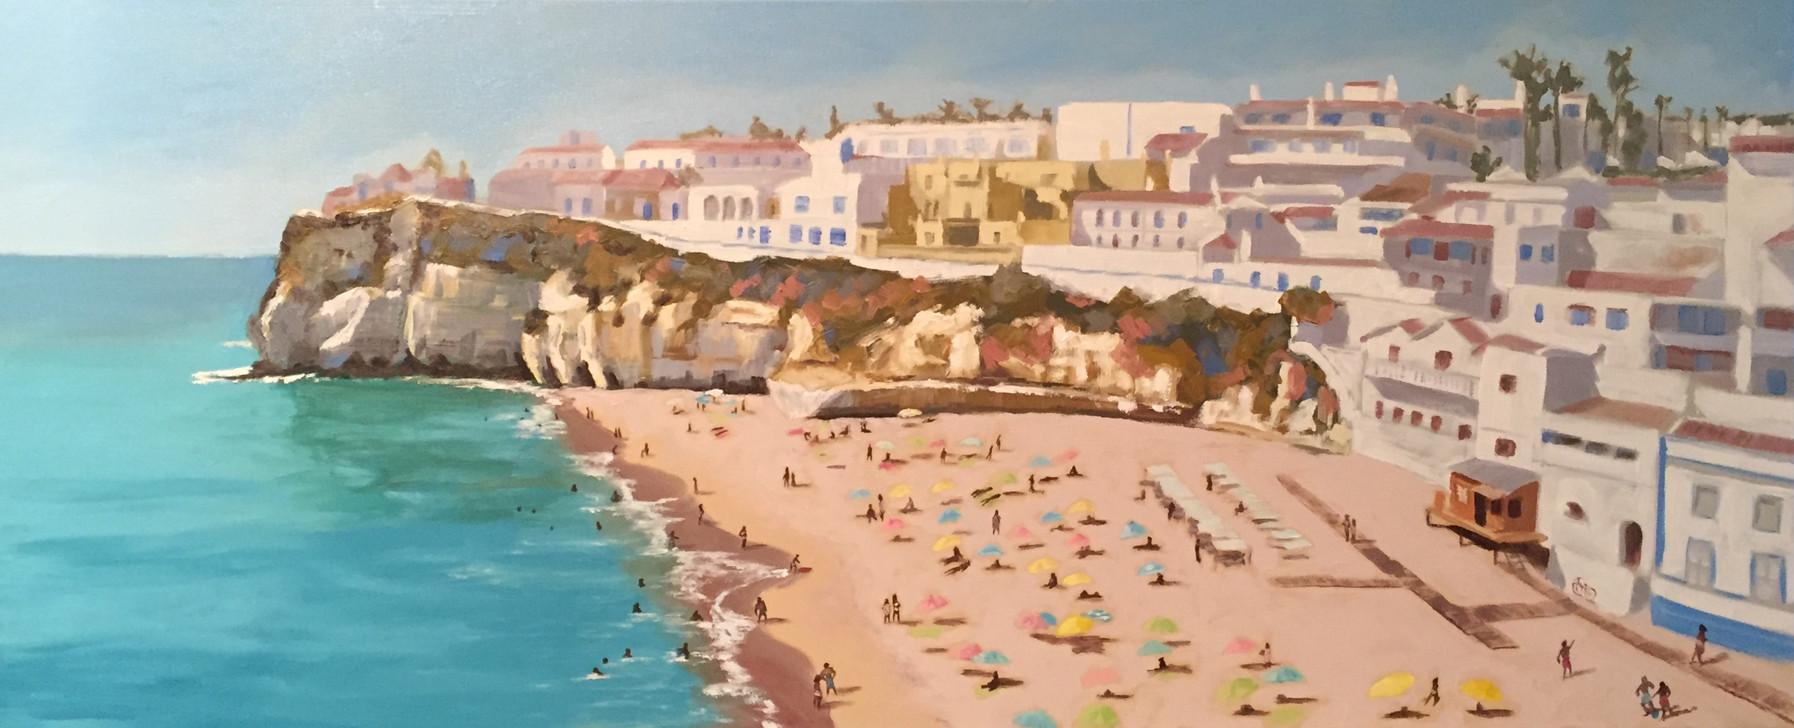 Carvoeiro Beach Summer 2019